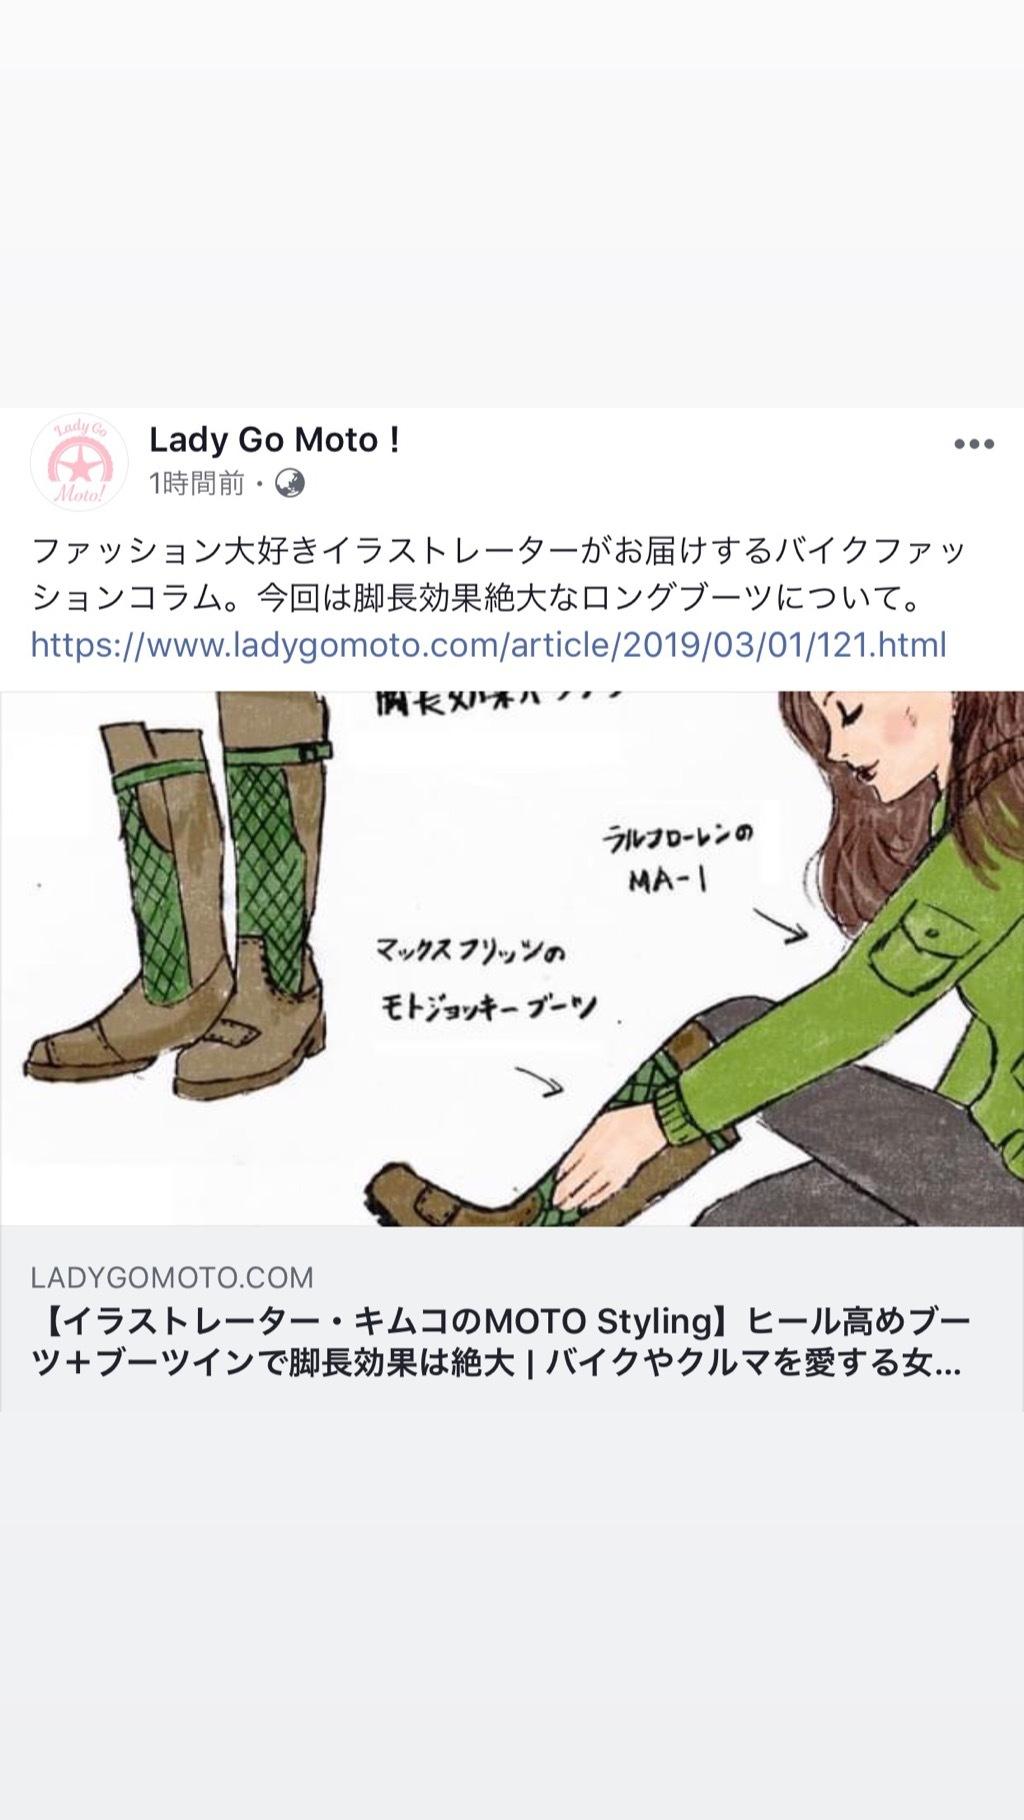 Lady moto go‼︎の最新版です。_d0178795_04294665.jpg